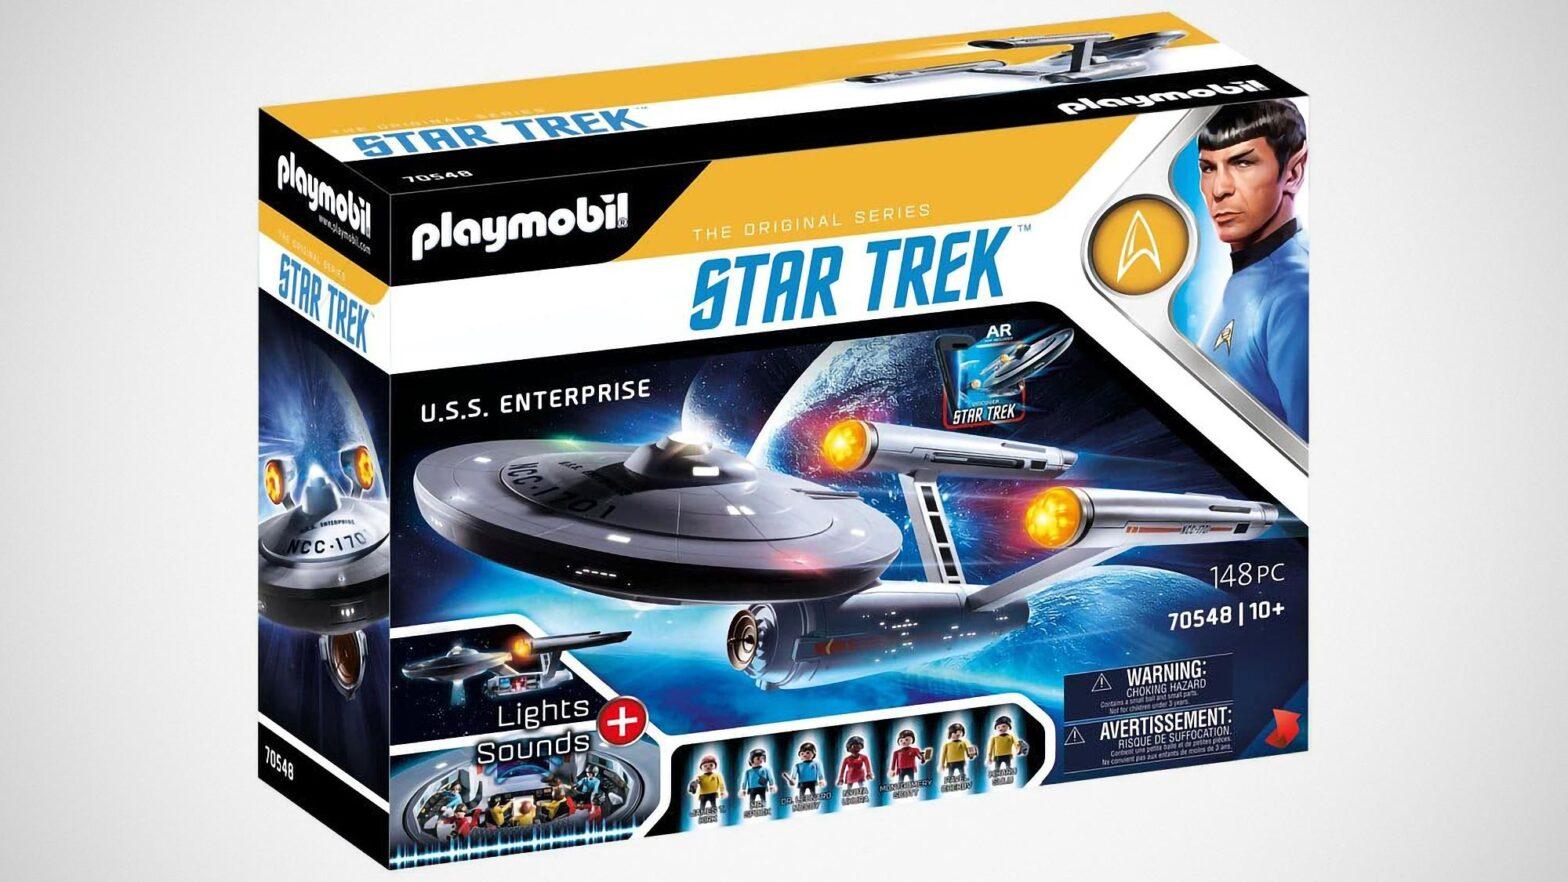 Playmobil 70548 Star Trek U.S.S. Enterprise Playset